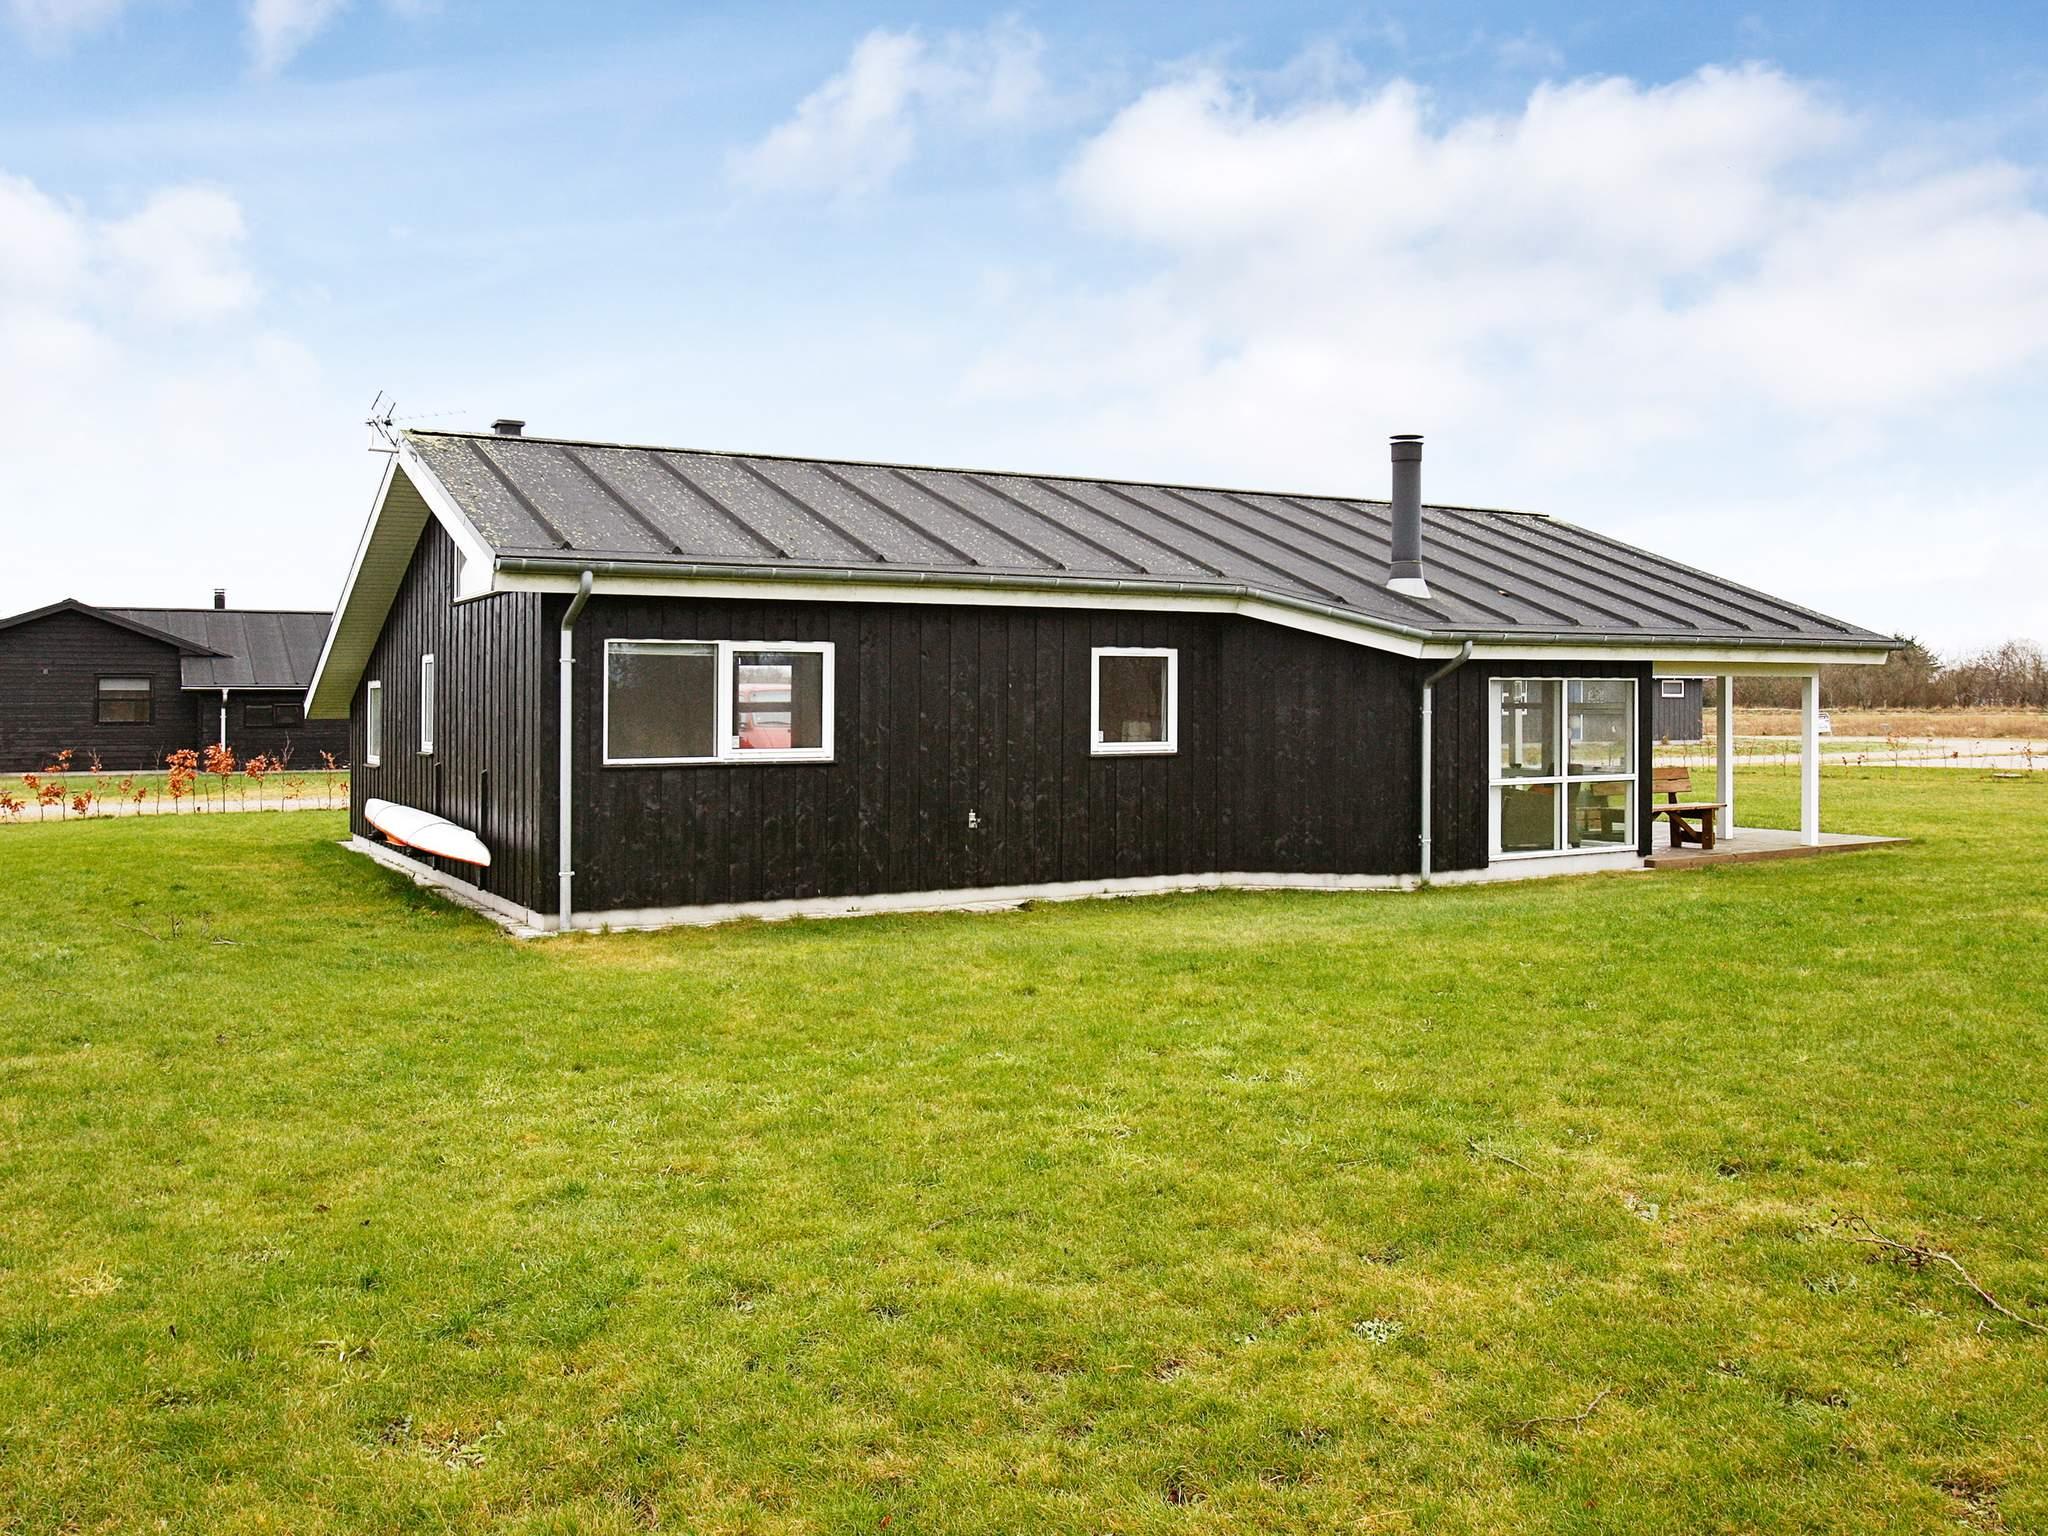 Ferienhaus Øster Hurup (921408), Øster Hurup, , Ostjütland, Dänemark, Bild 11